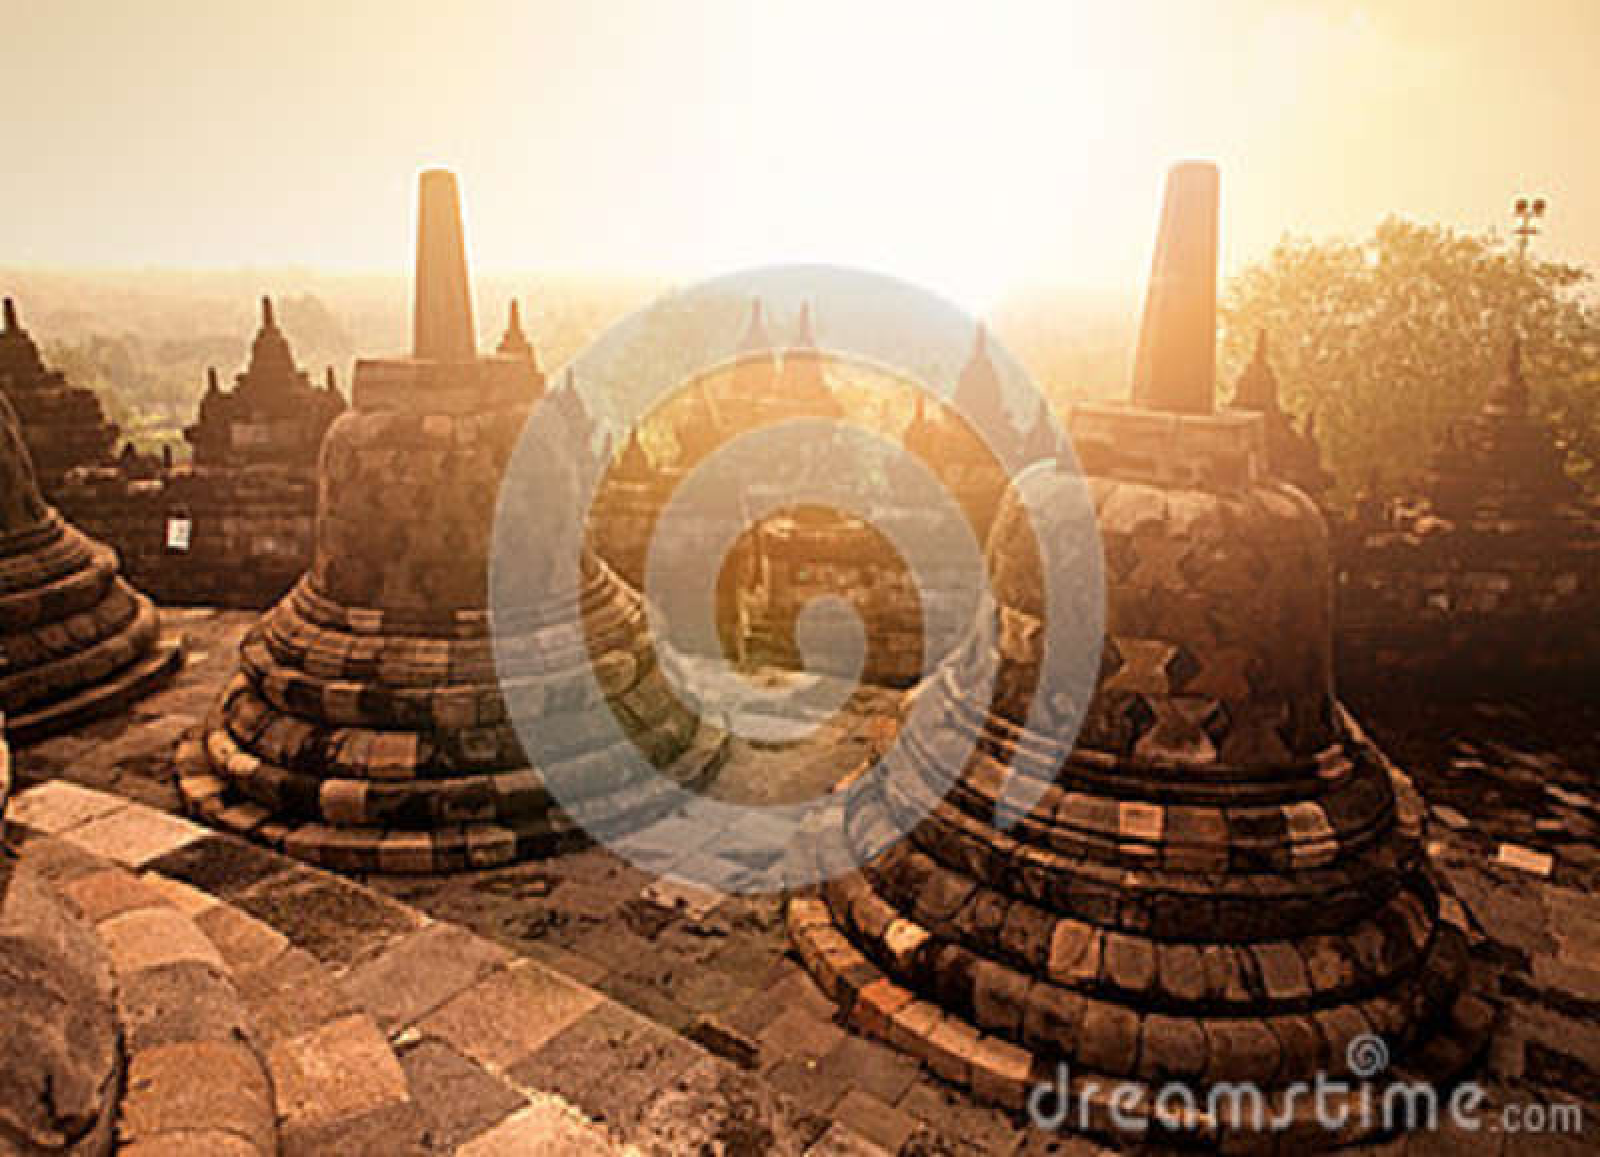 Ancient monument of Borobudur Buddhist temple at sunrise, Yogyakarta, Java Indonesia.